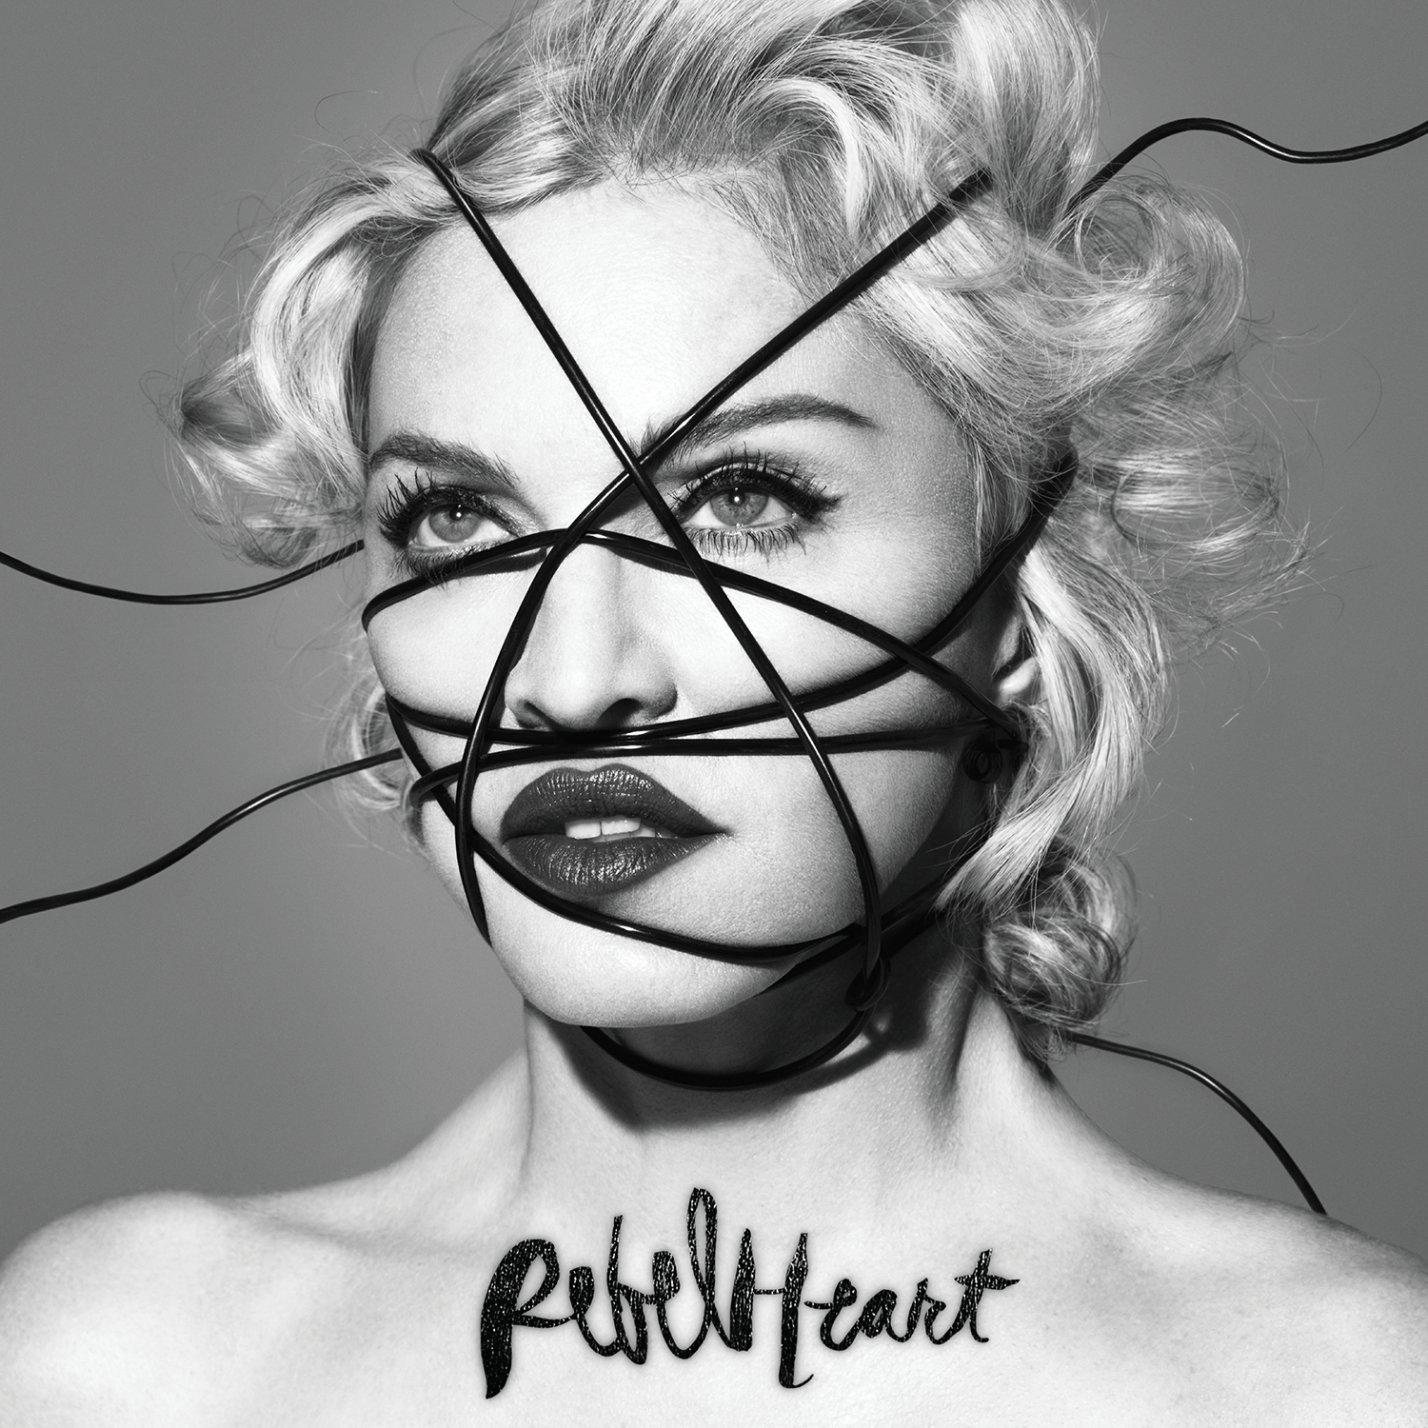 Vinilo : Madonna - Rebel Heart (Deluxe) [Explicit Content] (Deluxe Edition, 2 Disc)